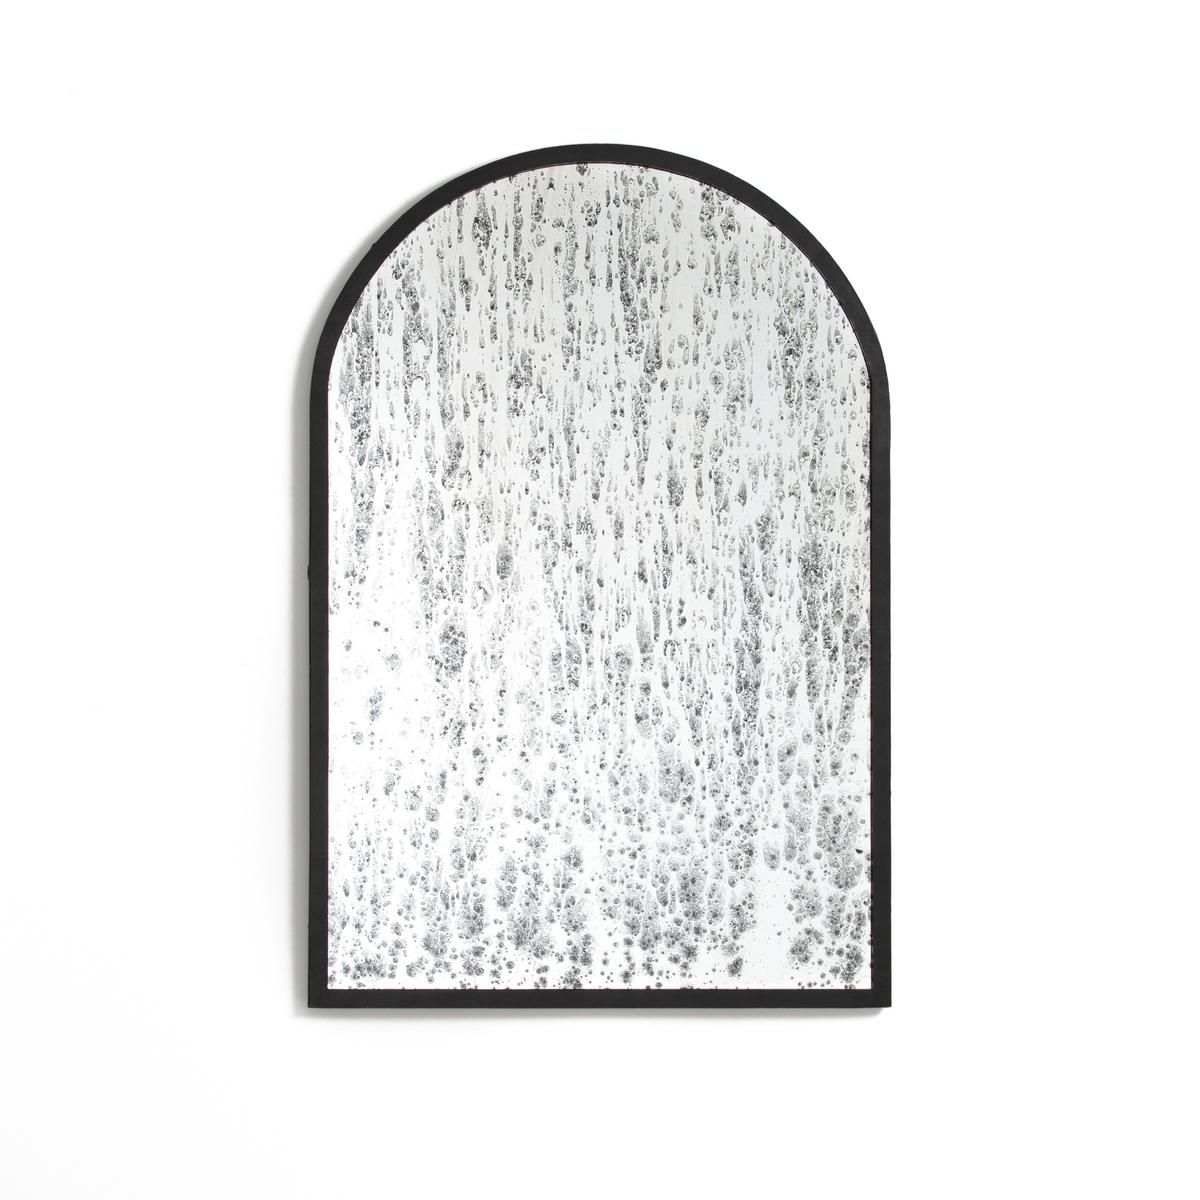 Зеркало, покрытое пятнами, металл LENAIG